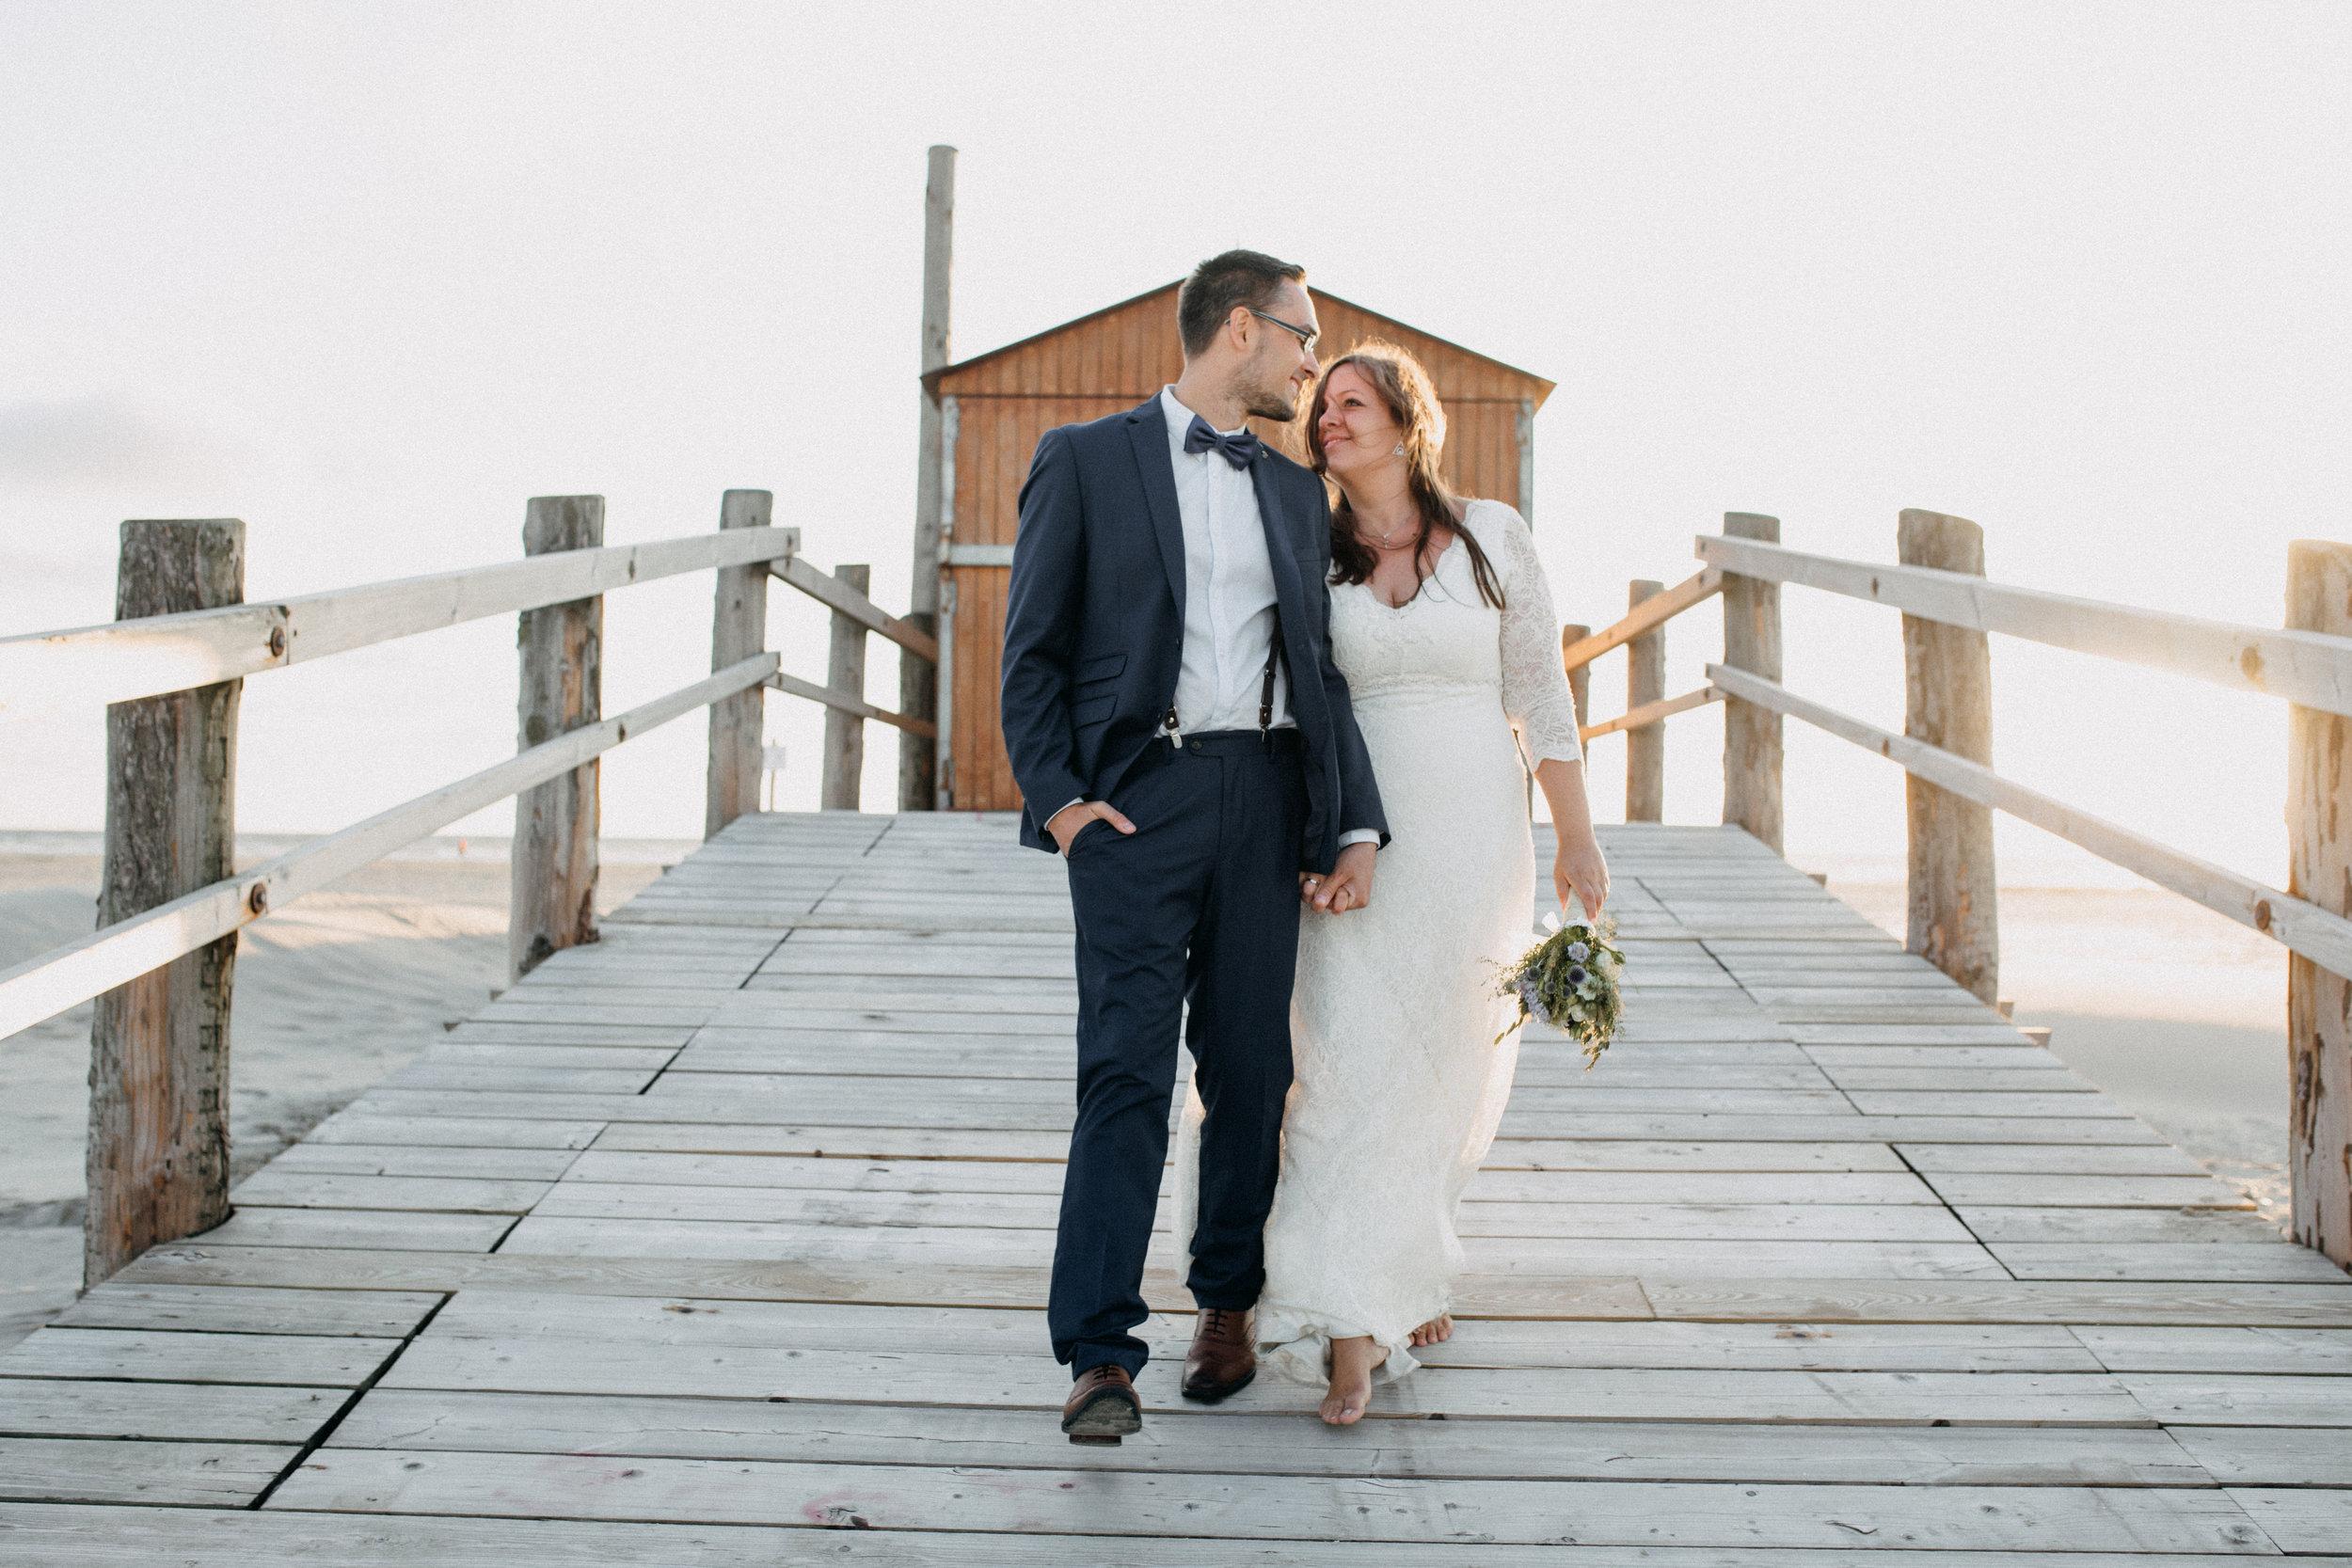 Heiraten - Sankt Peter Ording - Hochzeitsfotograf